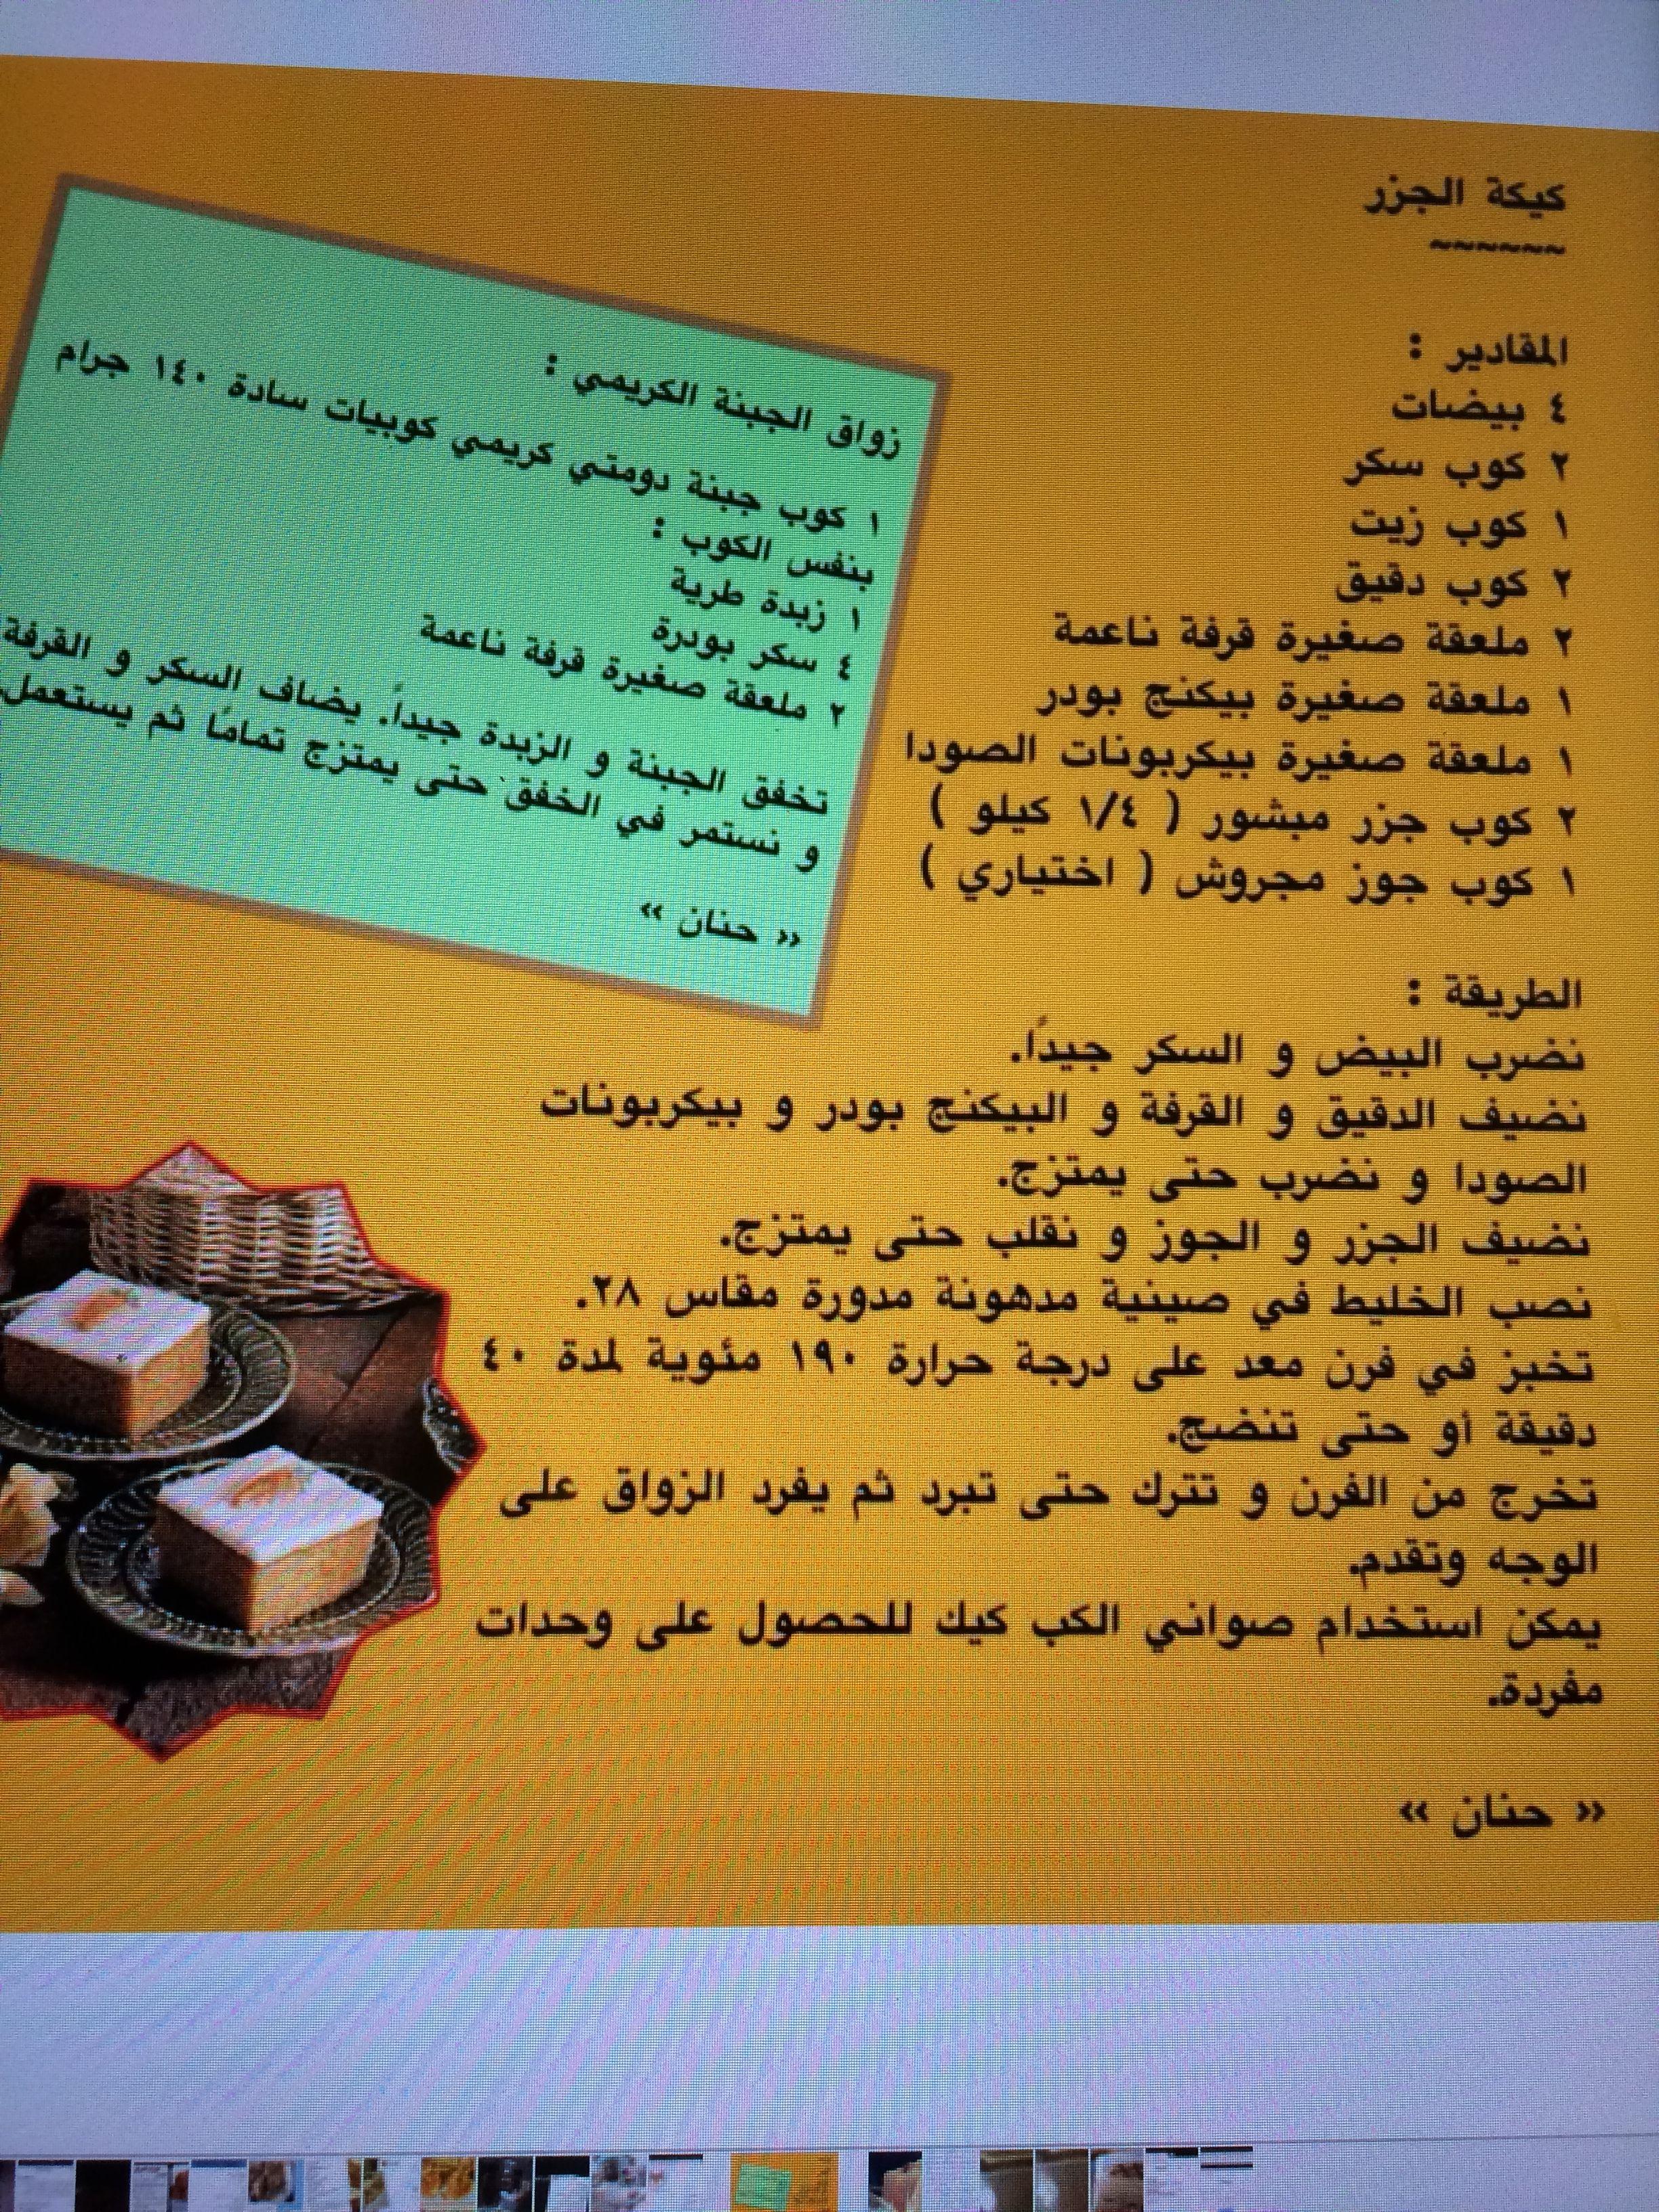 Pin By Hiba Msm On وصفات طعام بسيطة Event Event Ticket